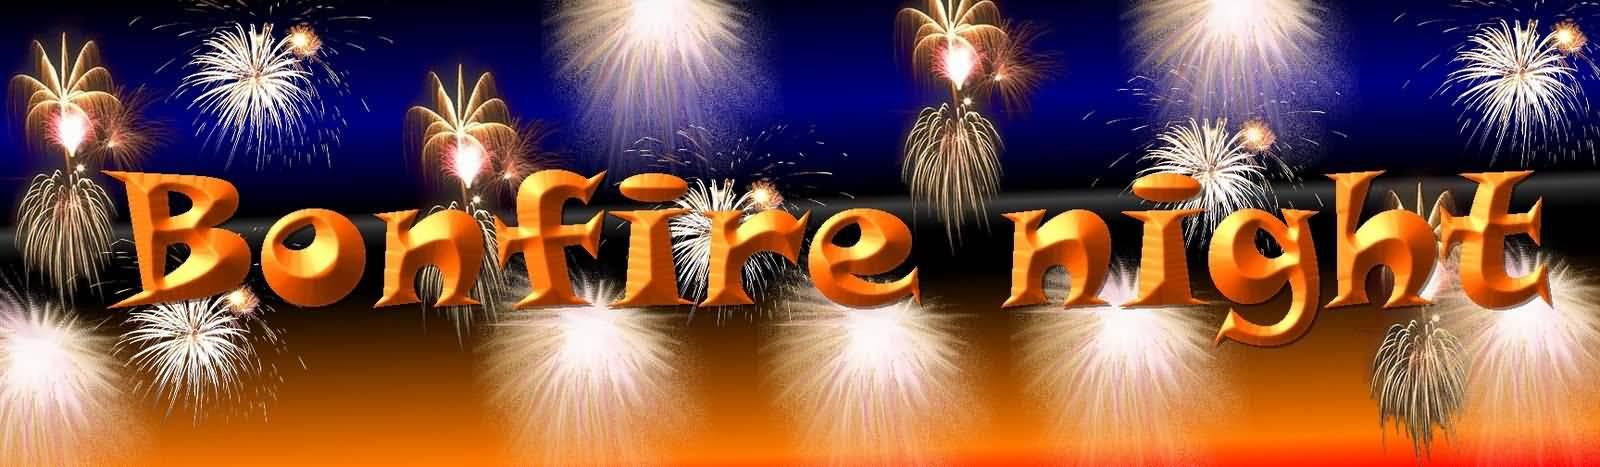 Bonfire night fireworks banner image clip art